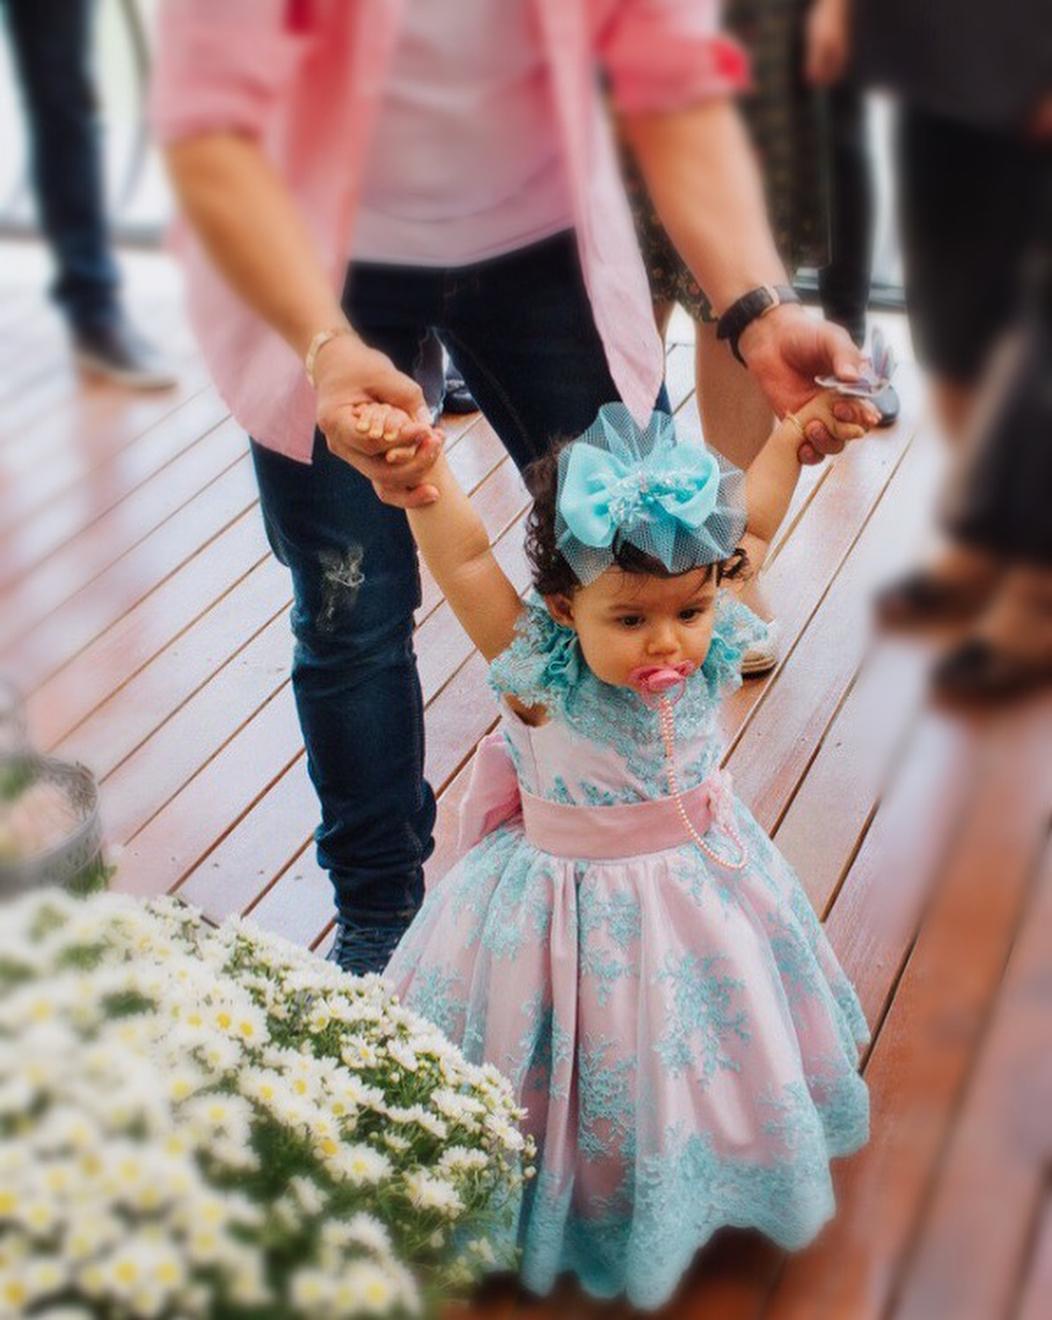 Antonella guiada pelo pai